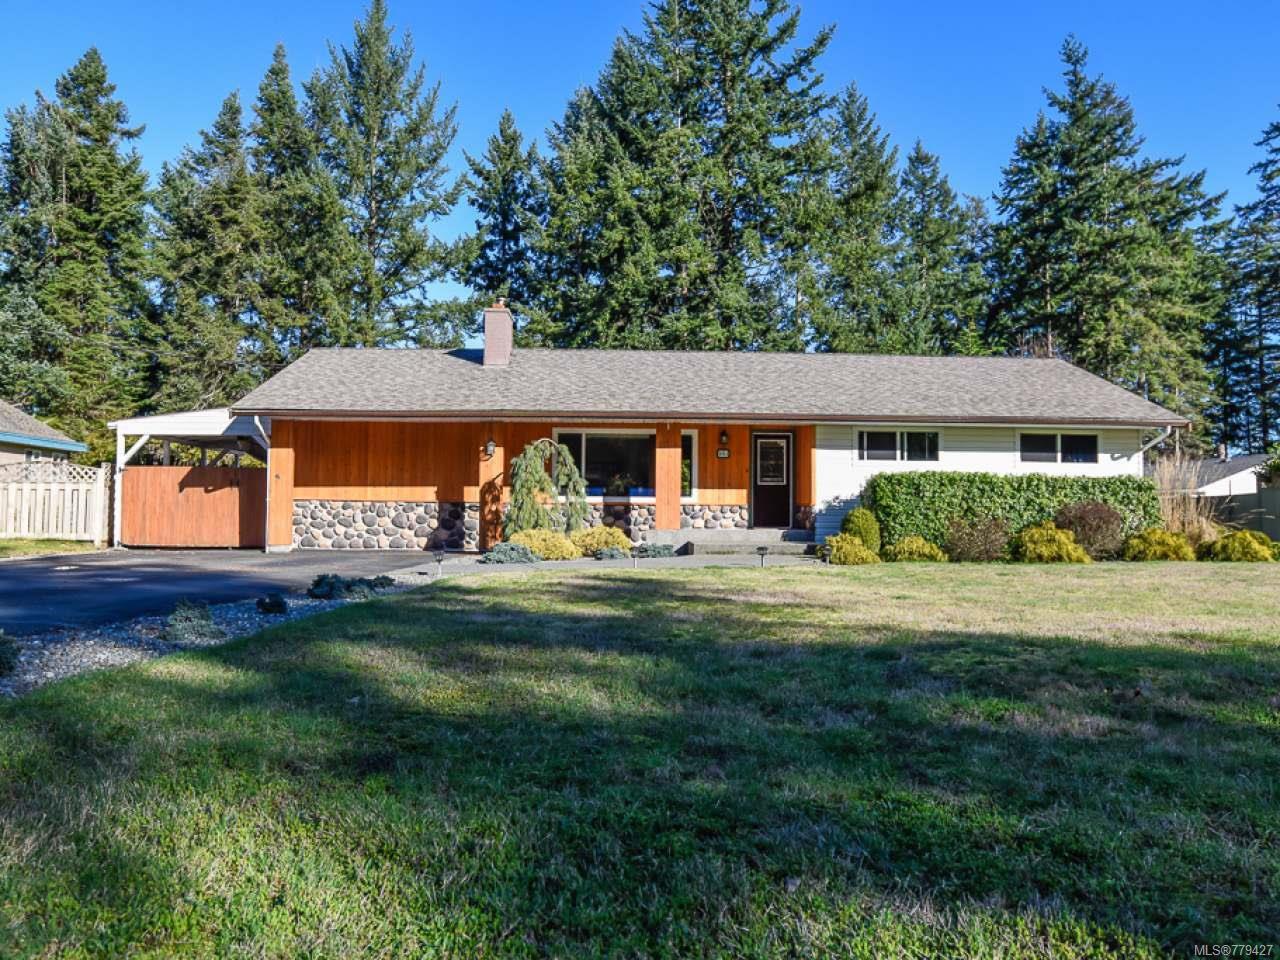 Main Photo: 1014 Vega Pl in COMOX: CV Comox Peninsula House for sale (Comox Valley)  : MLS®# 779427